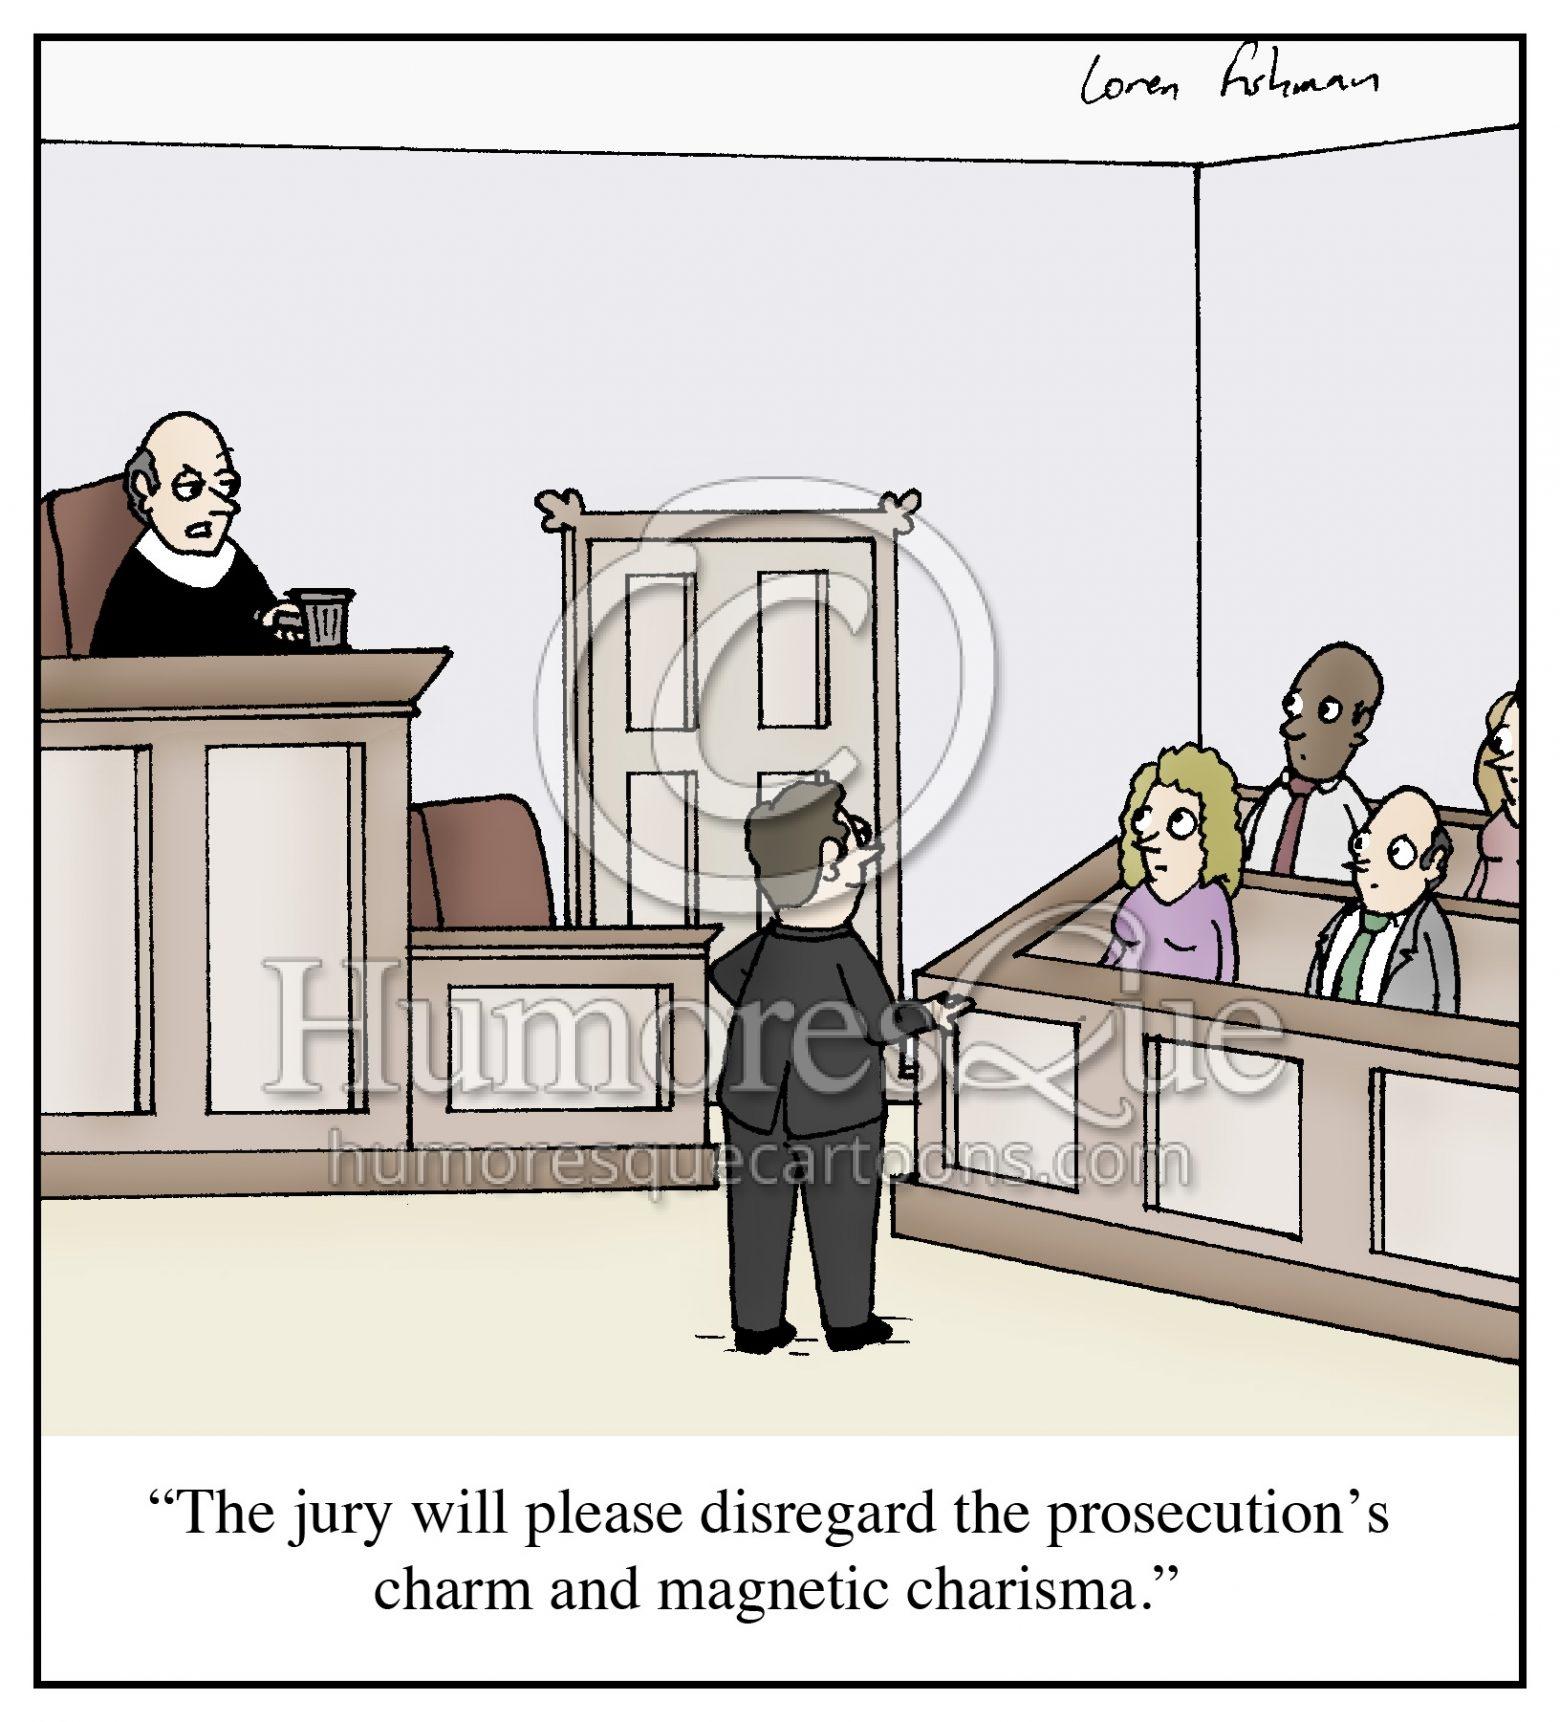 Lawyer prosecution courtroom trial cartoon